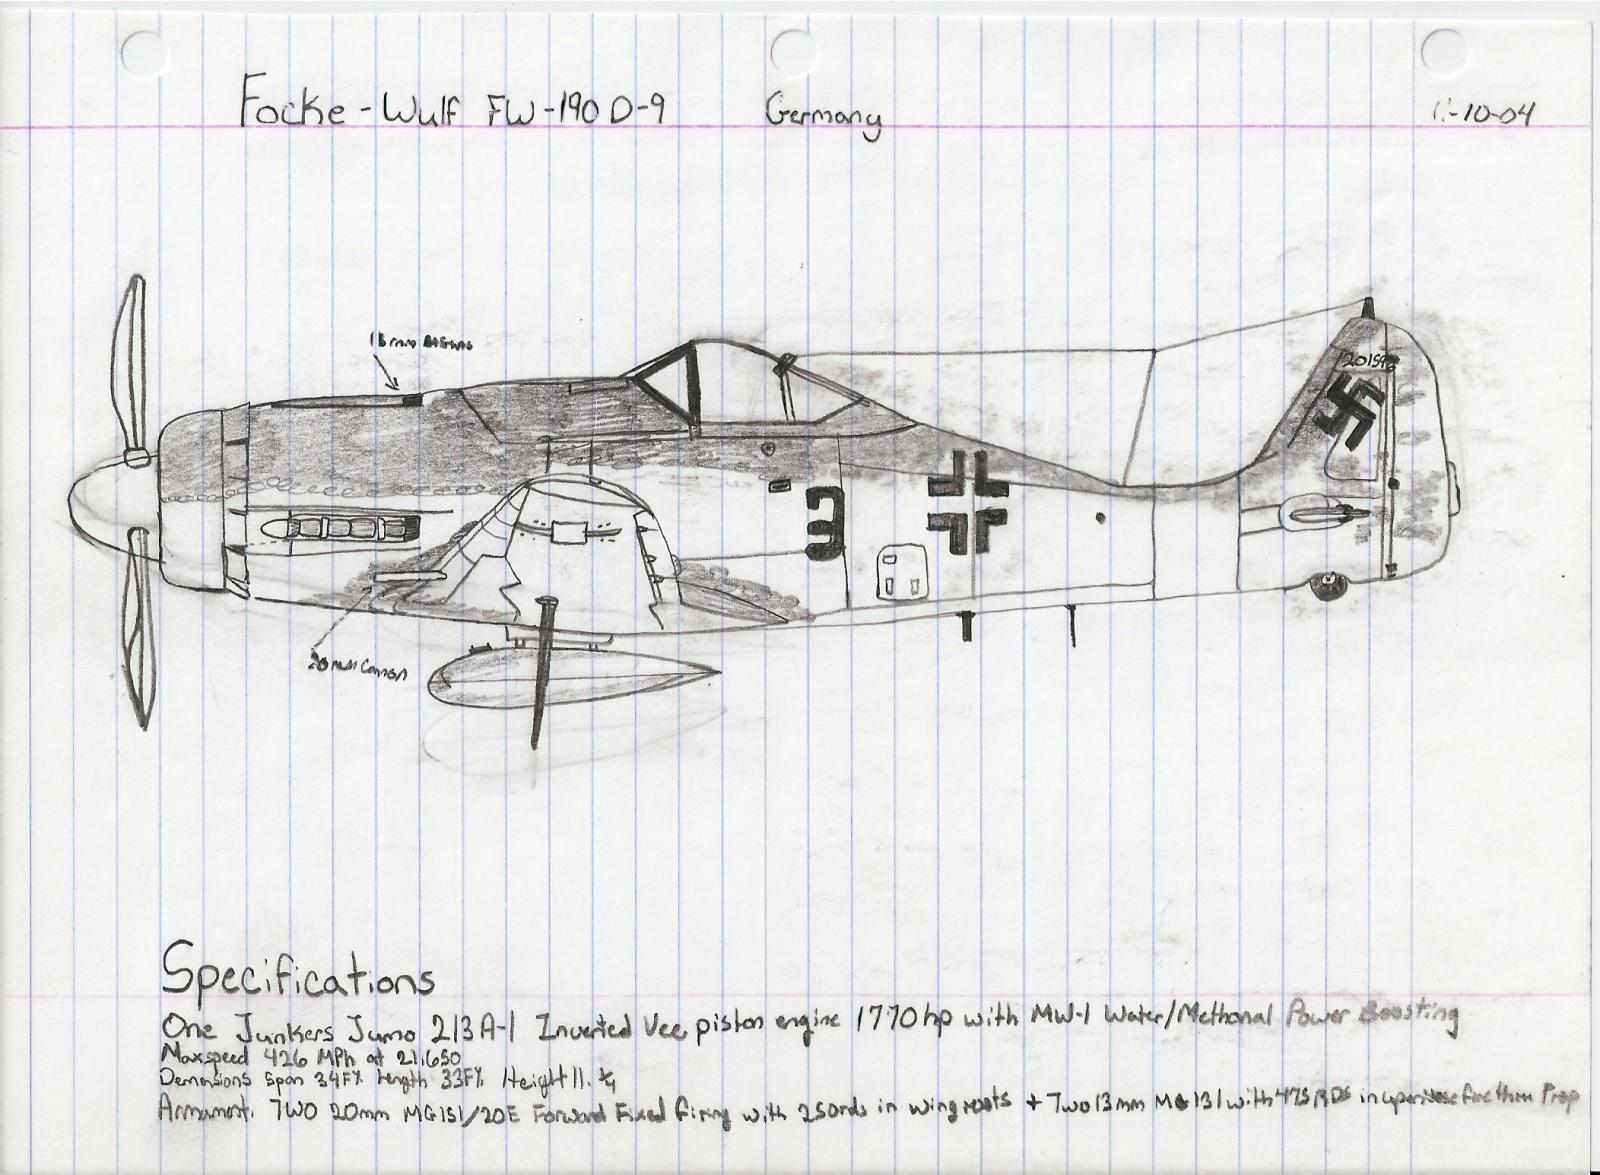 Focke-Wulf FW-190 D-9 DORA.jpg